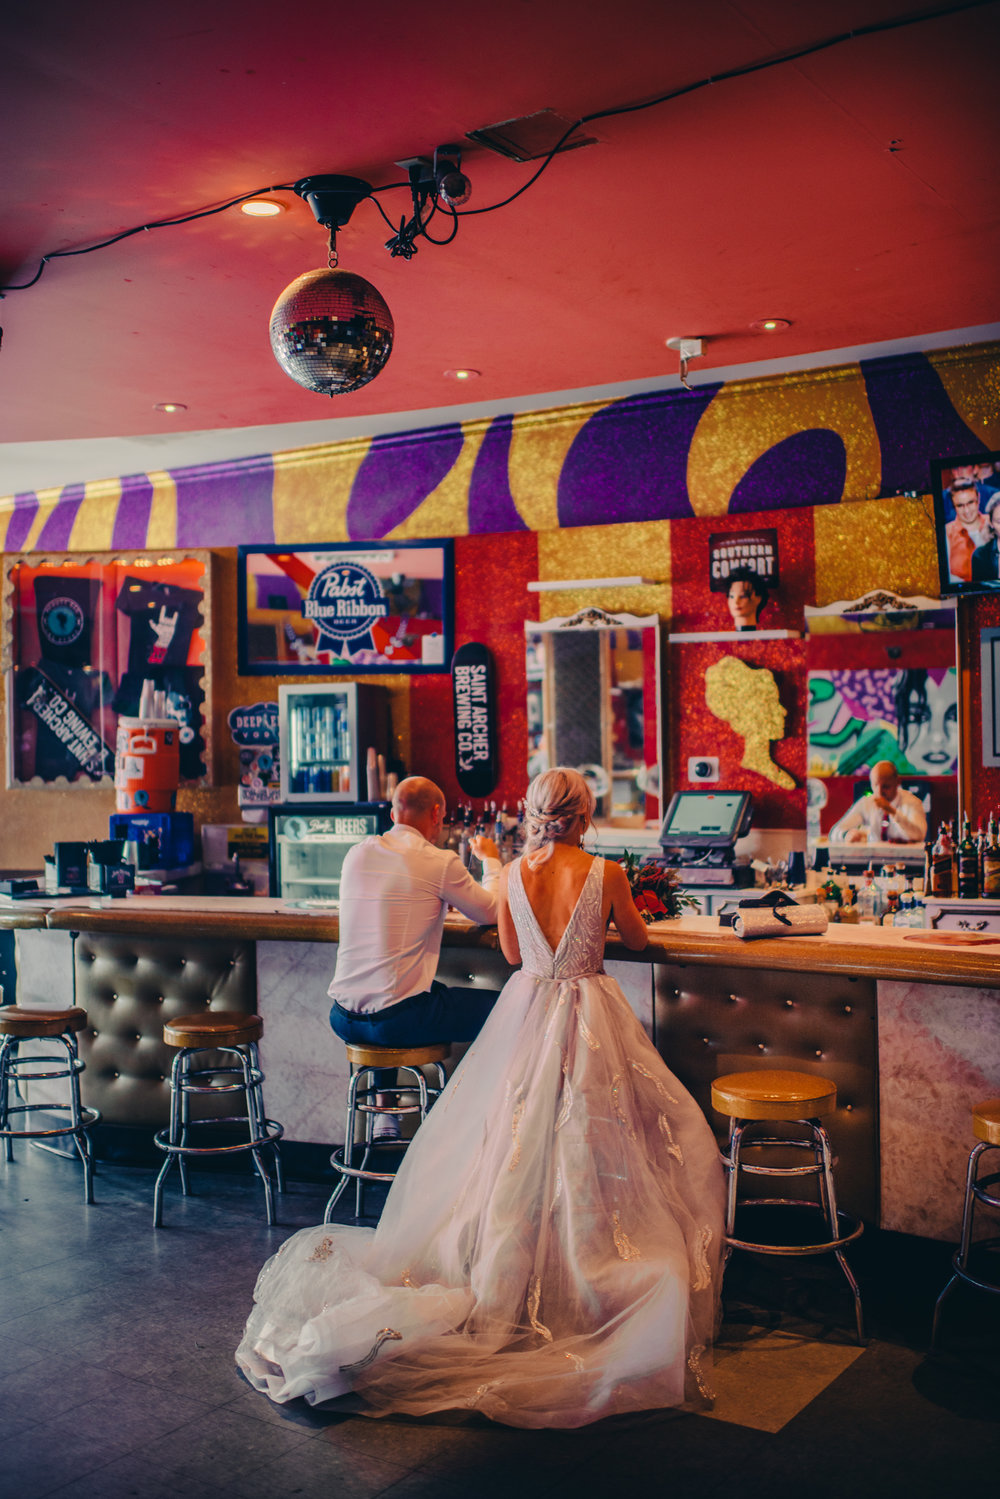 Las Vegas Elopement Rock n Roll Bride elopement Smoke Bomb-35.jpg